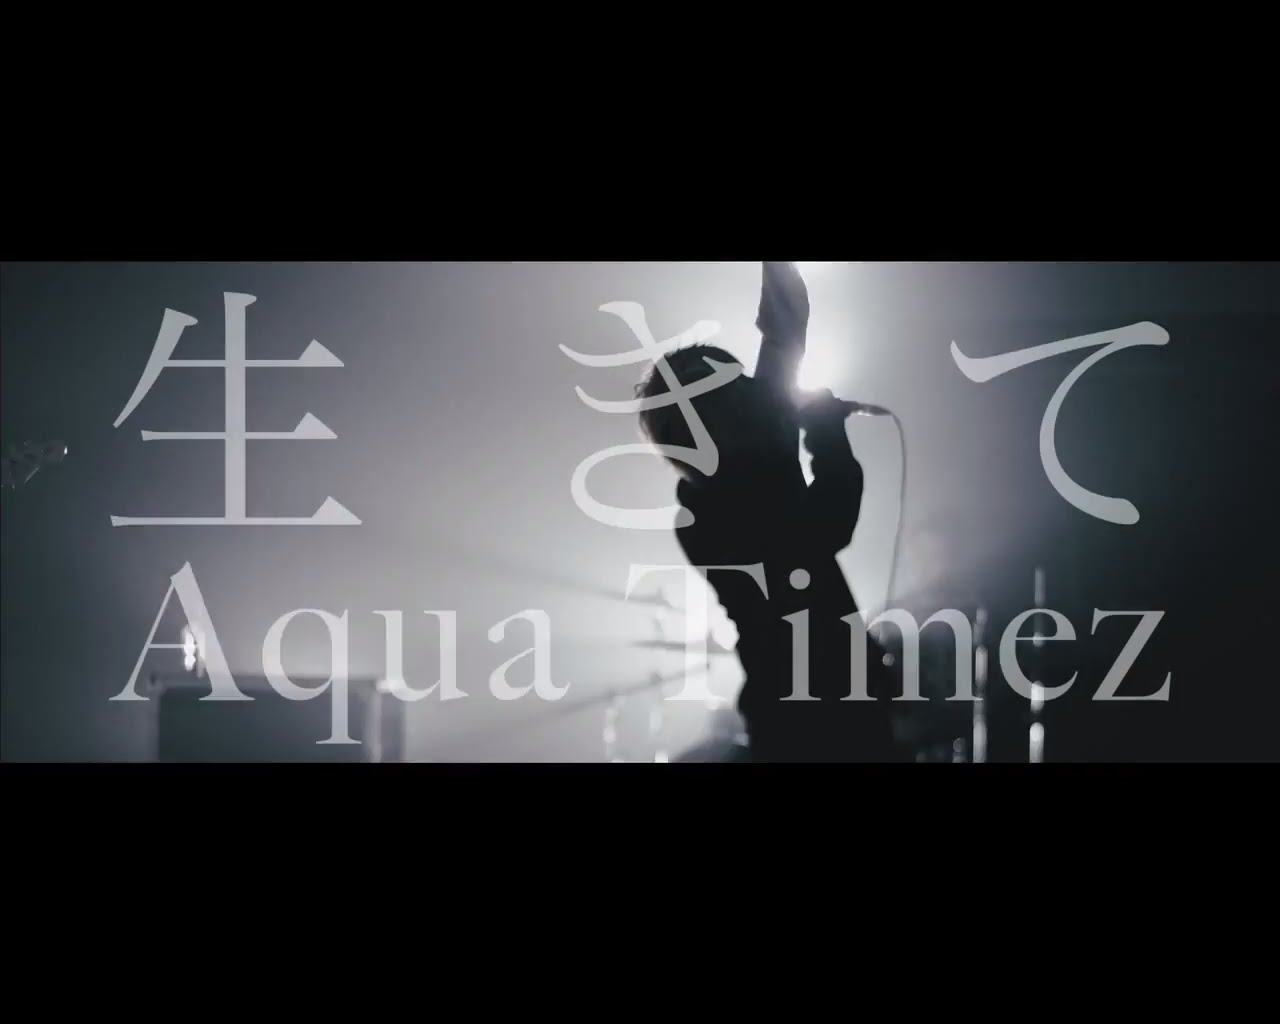 Aqua Timez 『生きて』  Music Video - YouTube